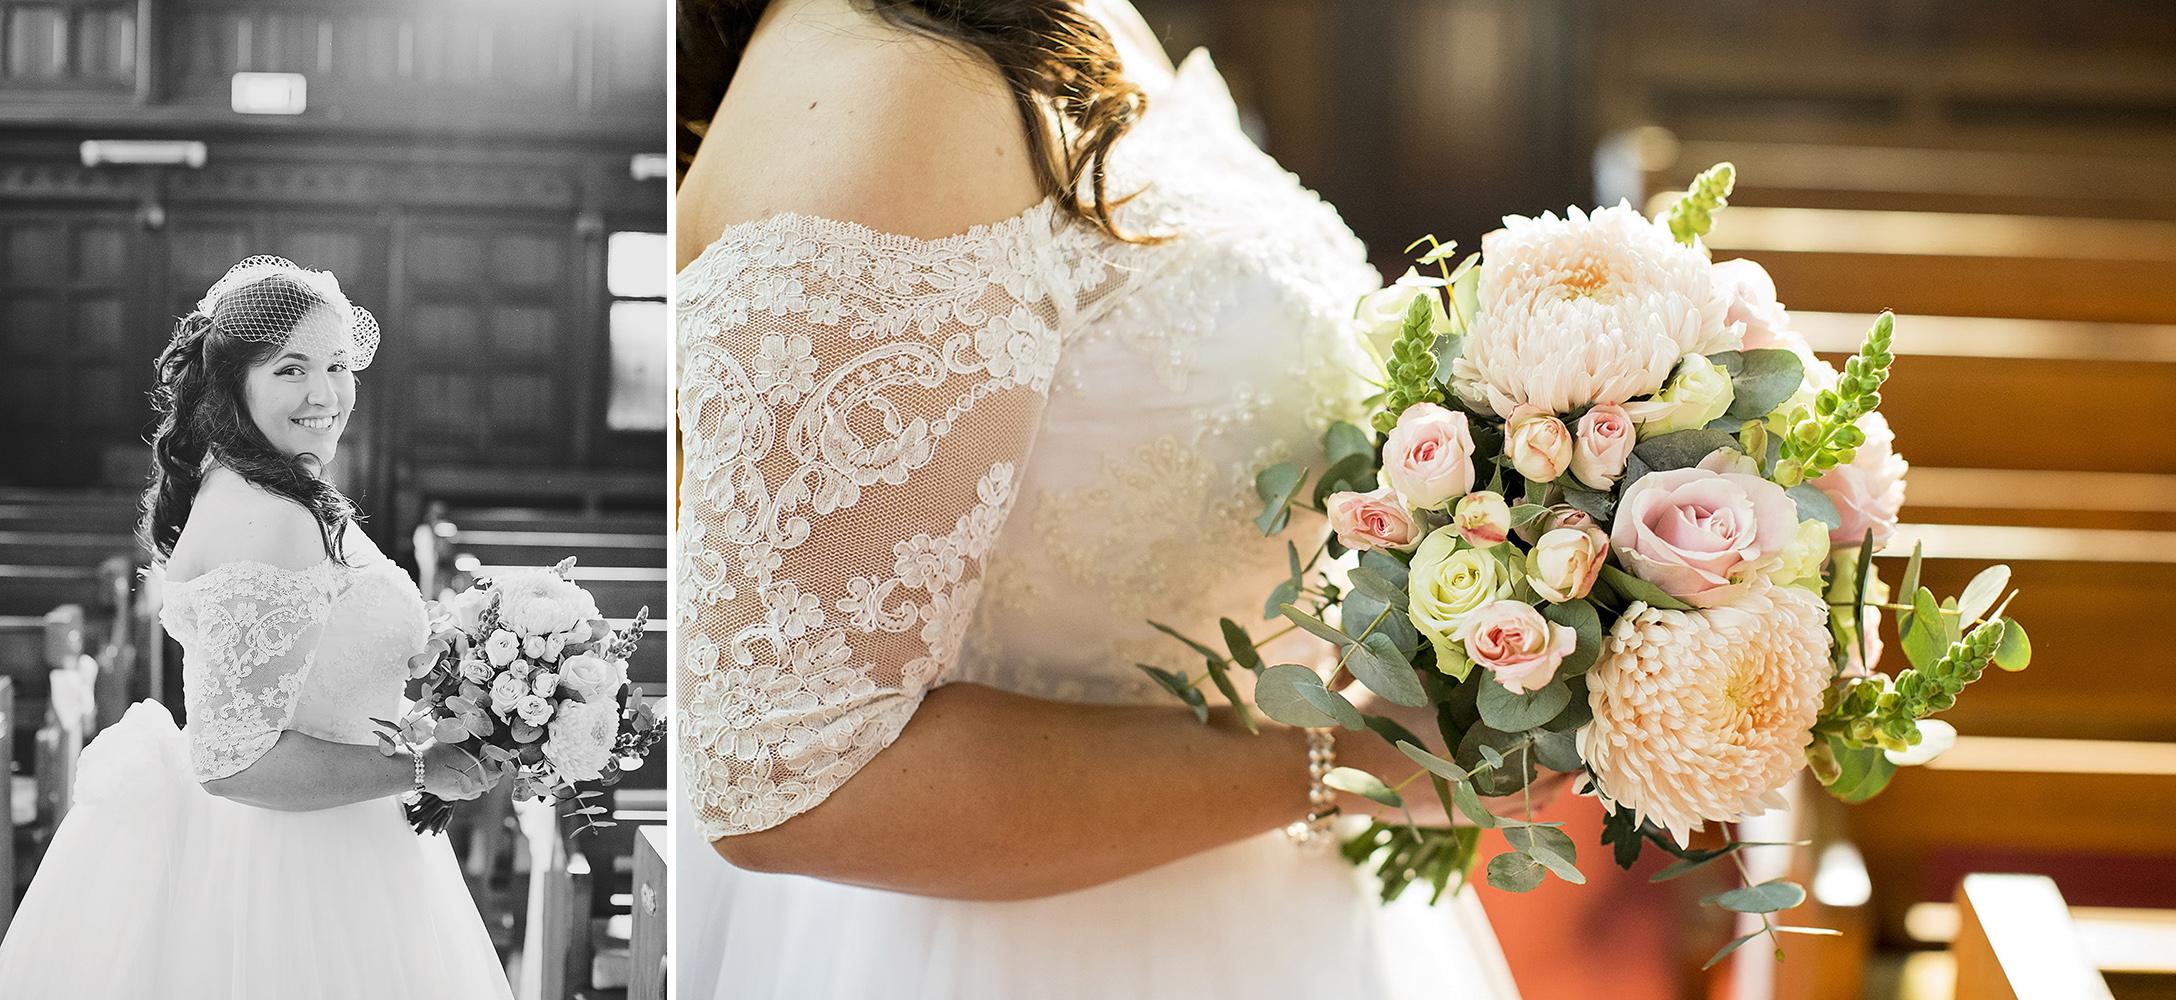 Adelaide Family Wedding Photography 12.jpg